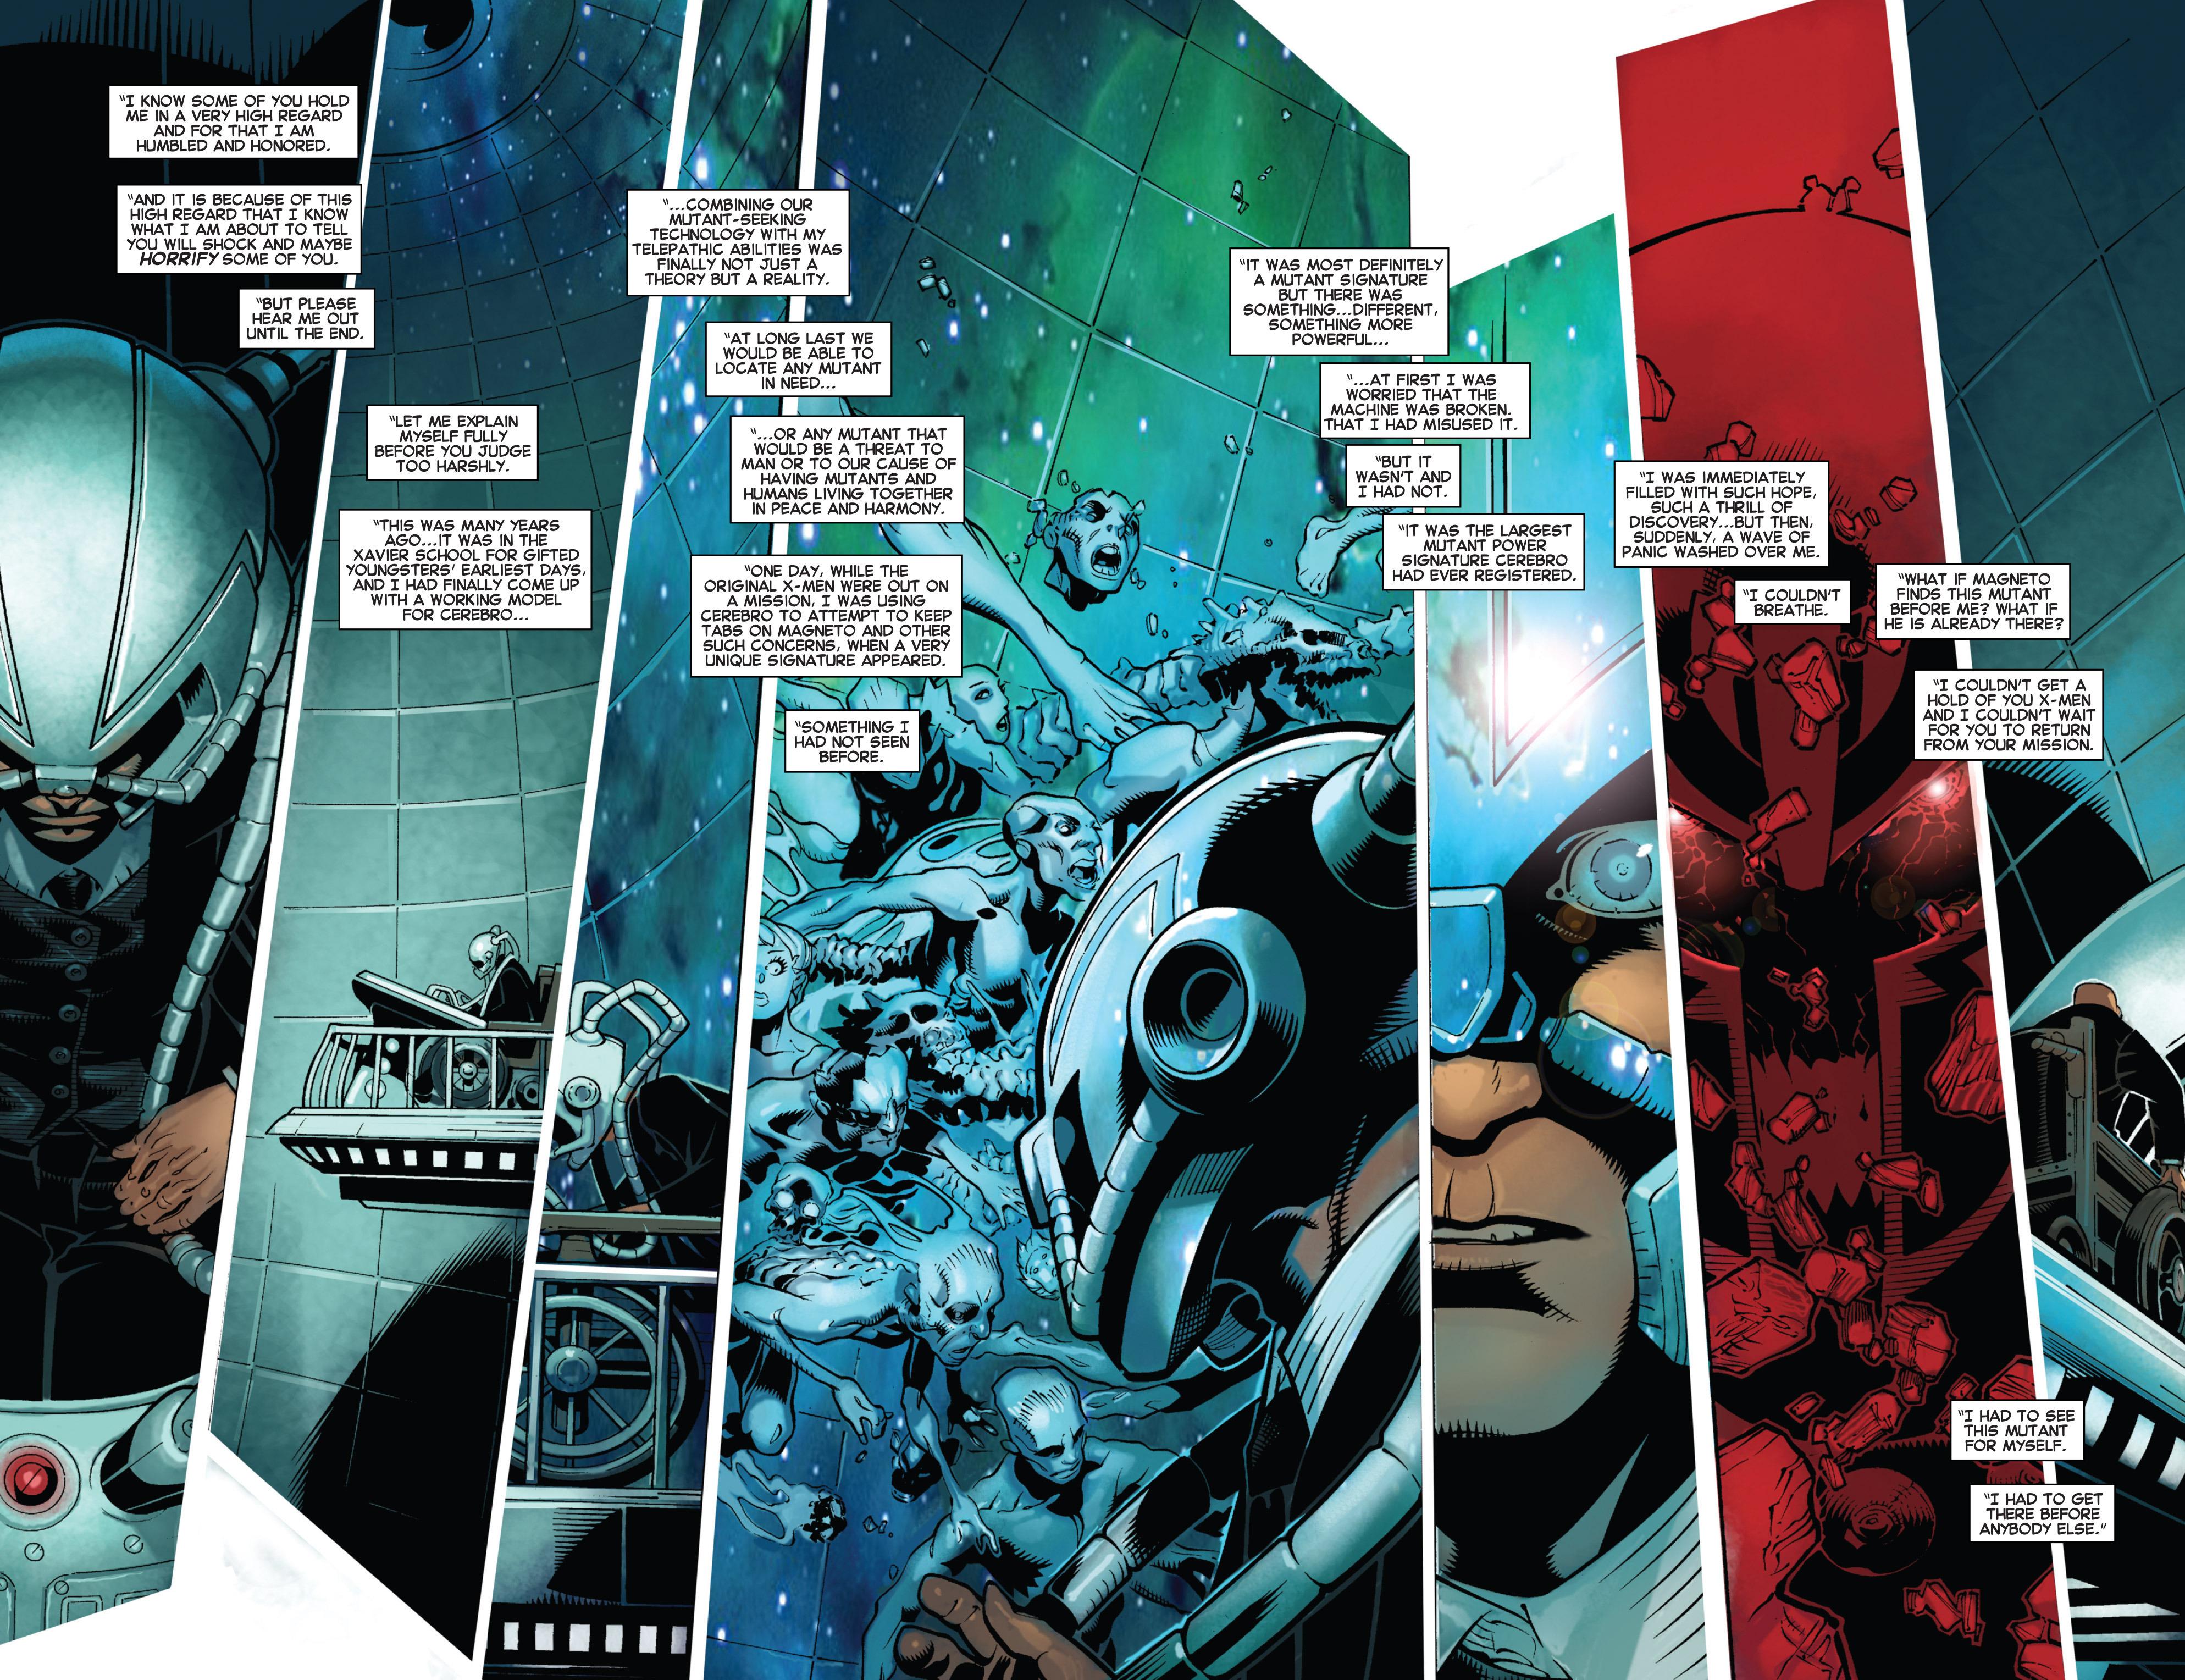 Read online Uncanny X-Men (2013) comic -  Issue # _TPB 4 - vs. S.H.I.E.L.D - 120